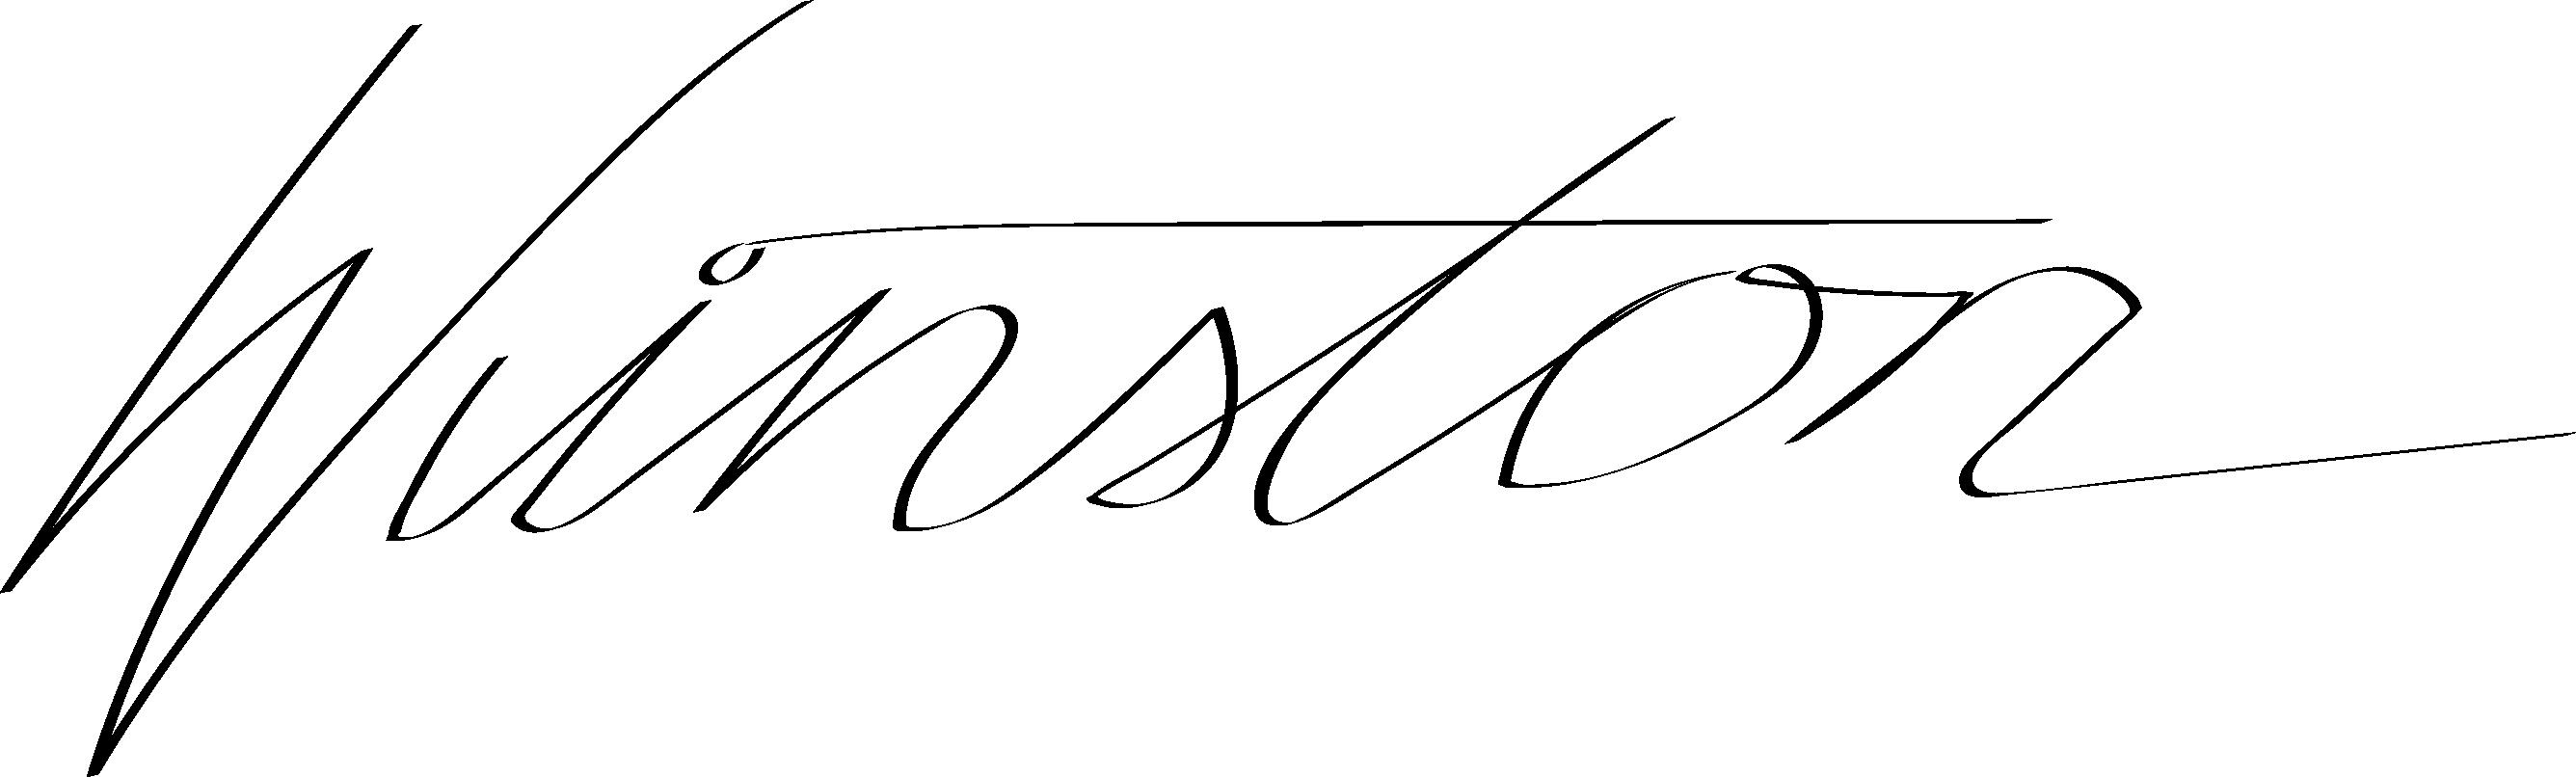 Winston Brinkerhoff Signature